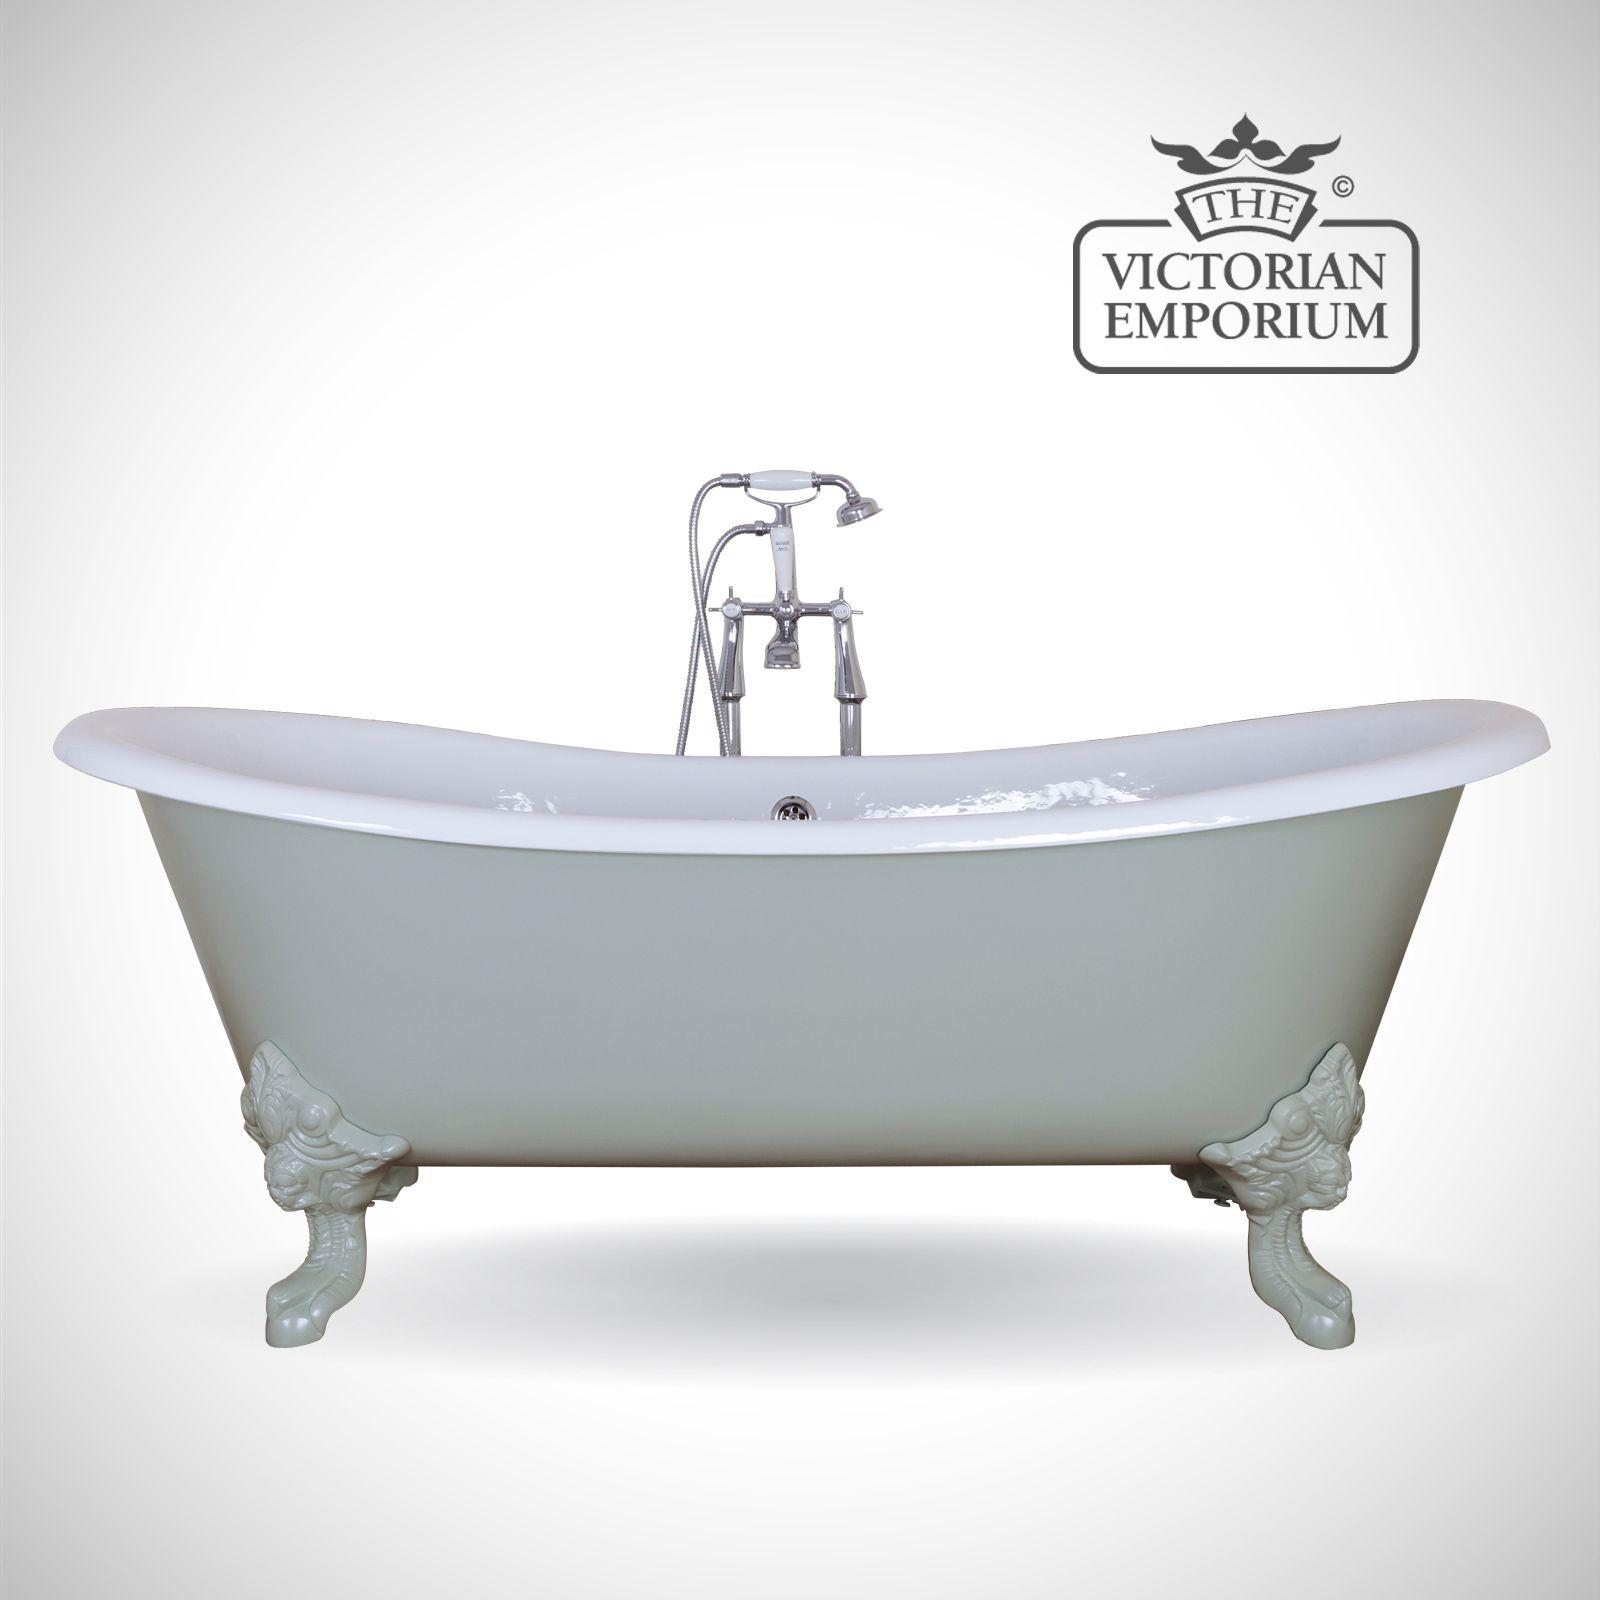 Painting enamel bathtub epoxy paint for bathtub elegant for Bath enamel paint